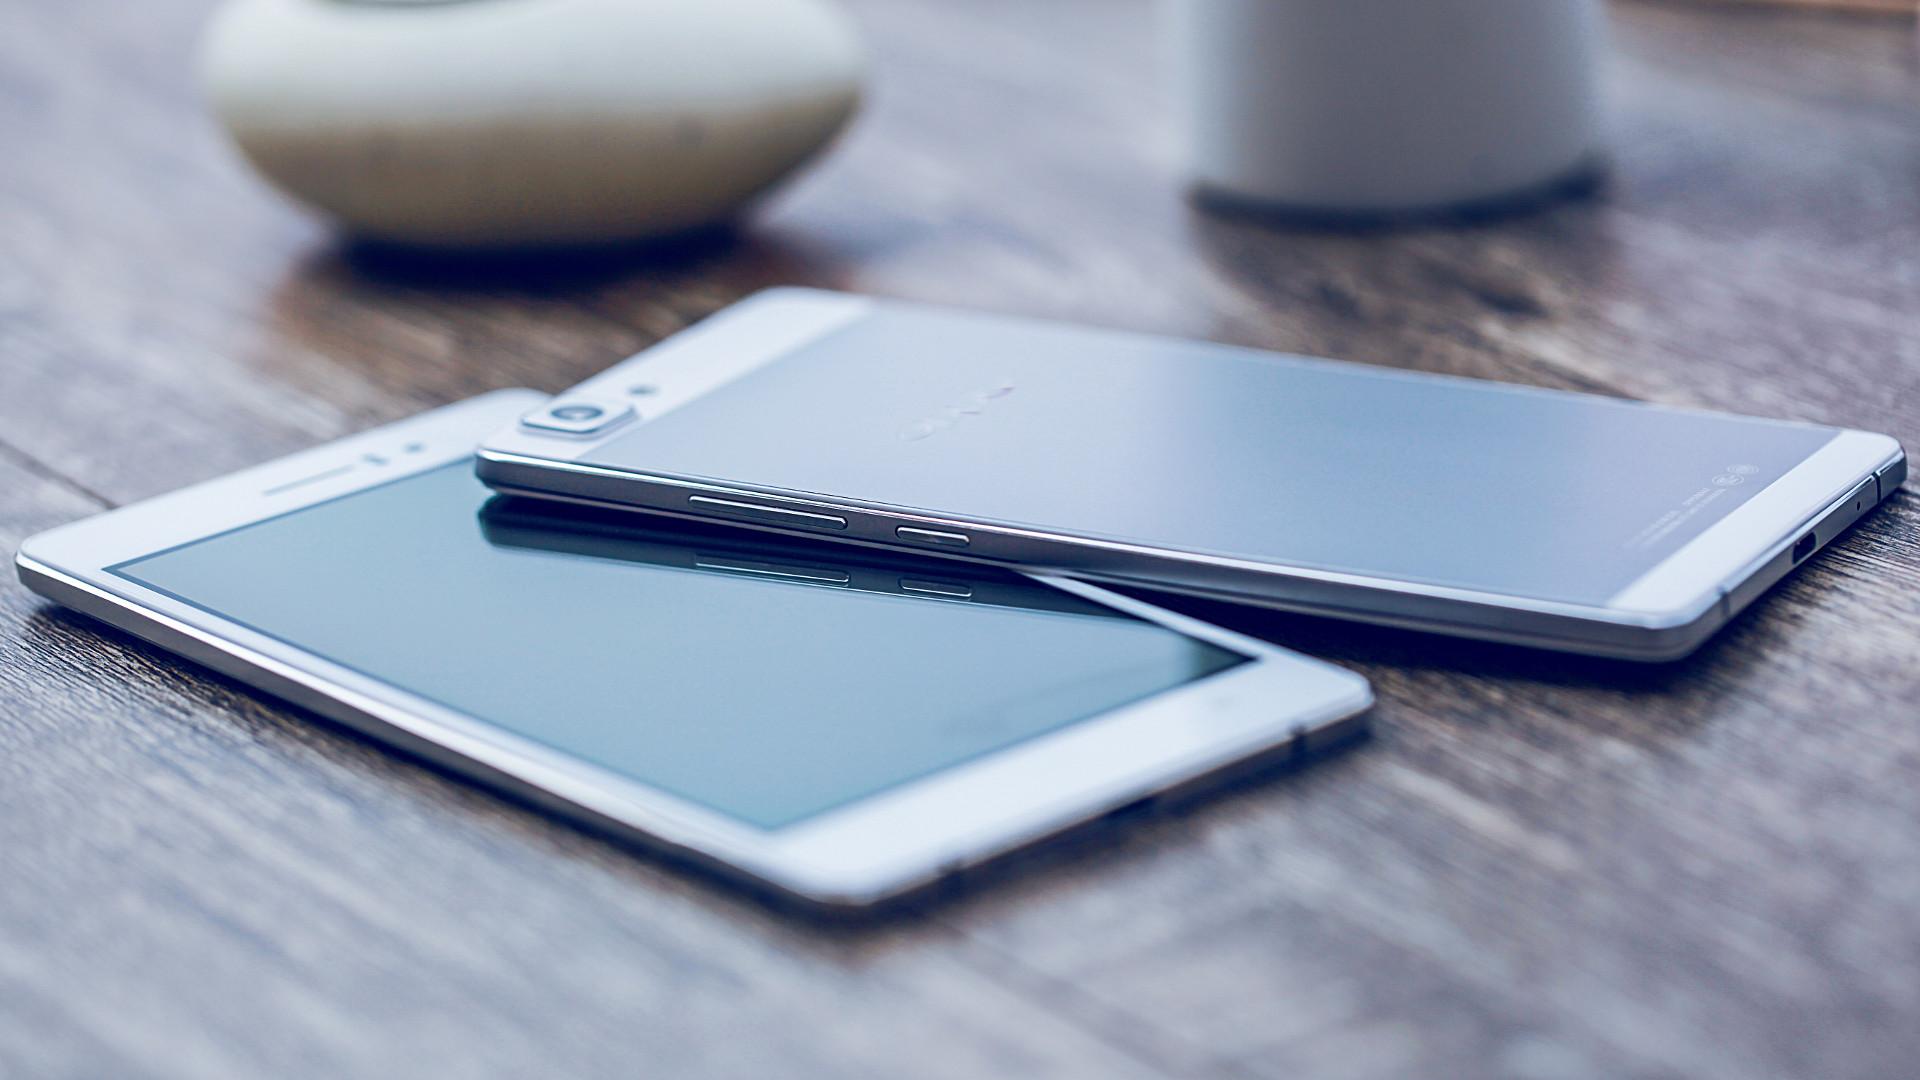 Названа десятка самых популярных смартфонов августа